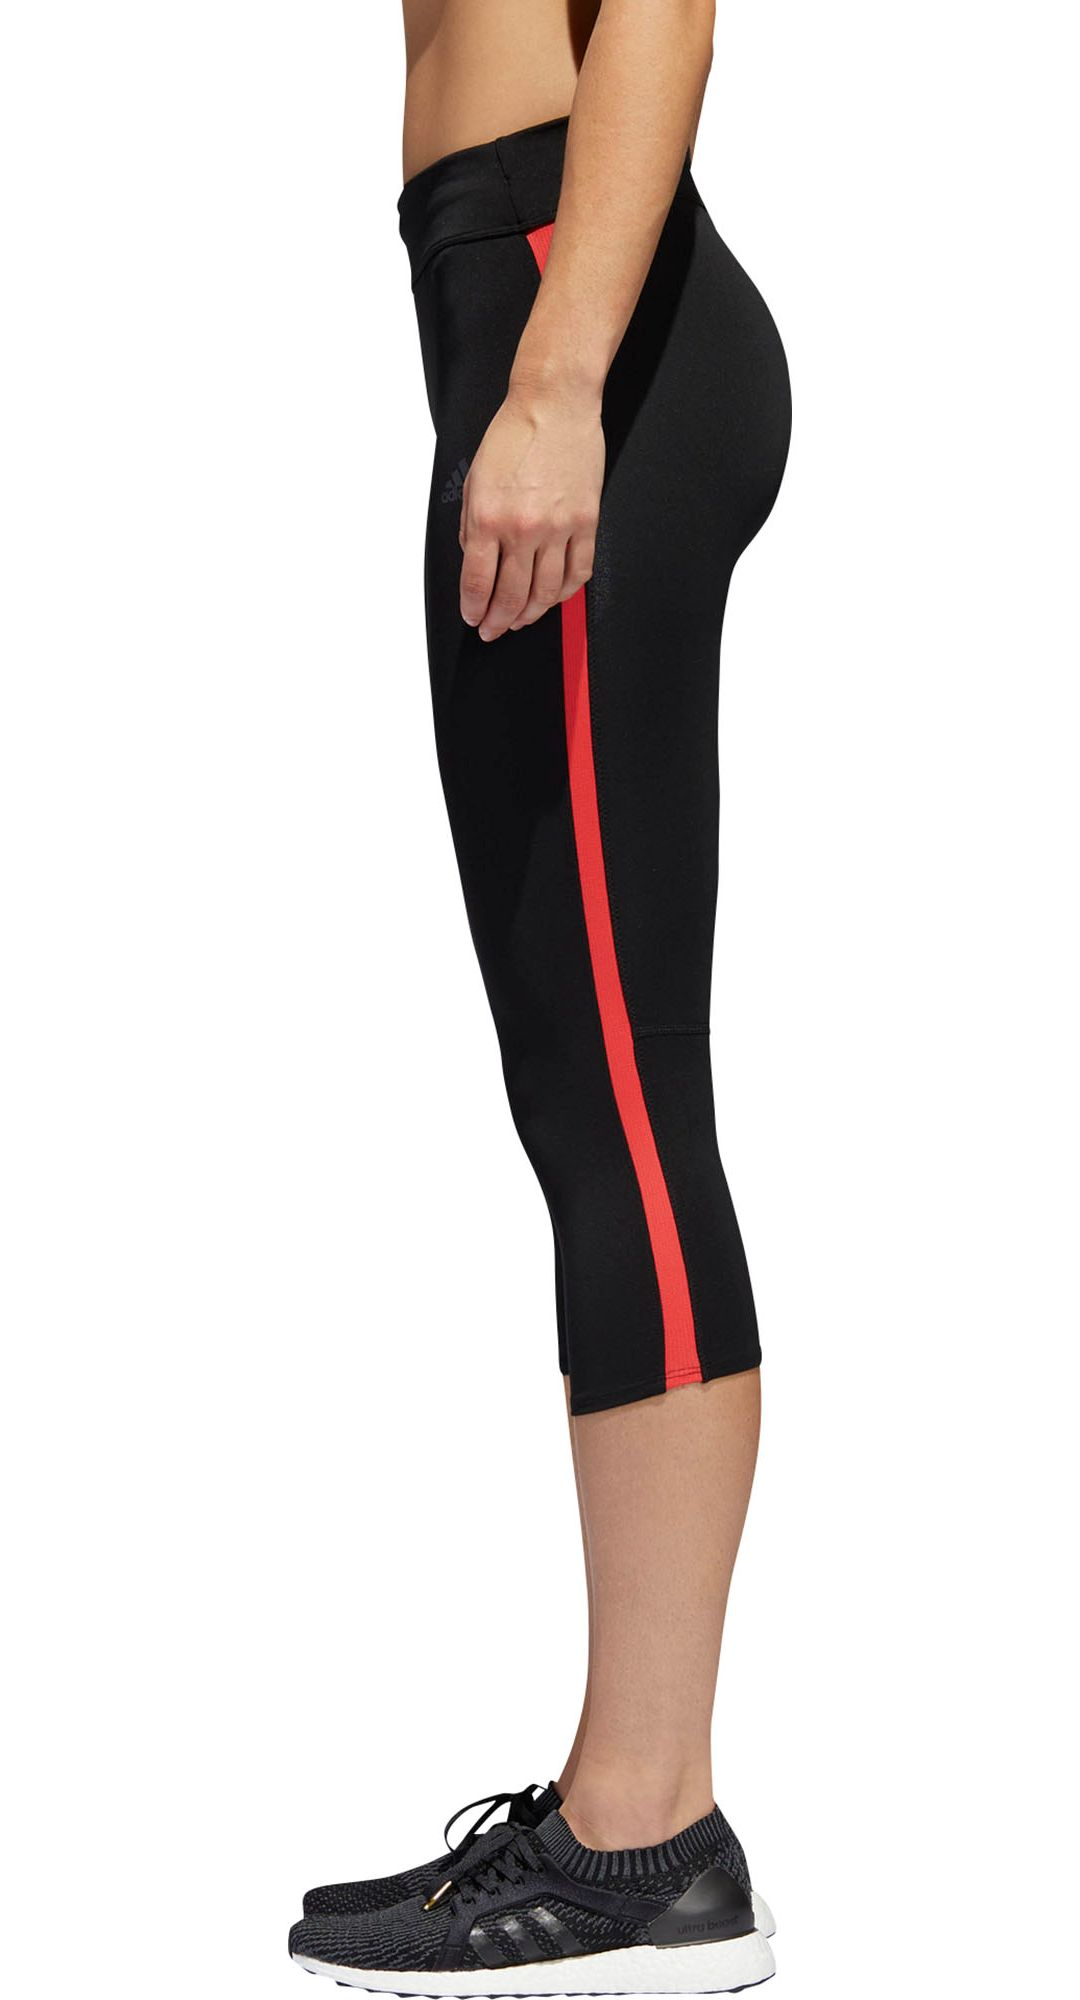 90ec224c866d1e adidas Women's Response Running 3/4 Tights | DICK'S Sporting Goods